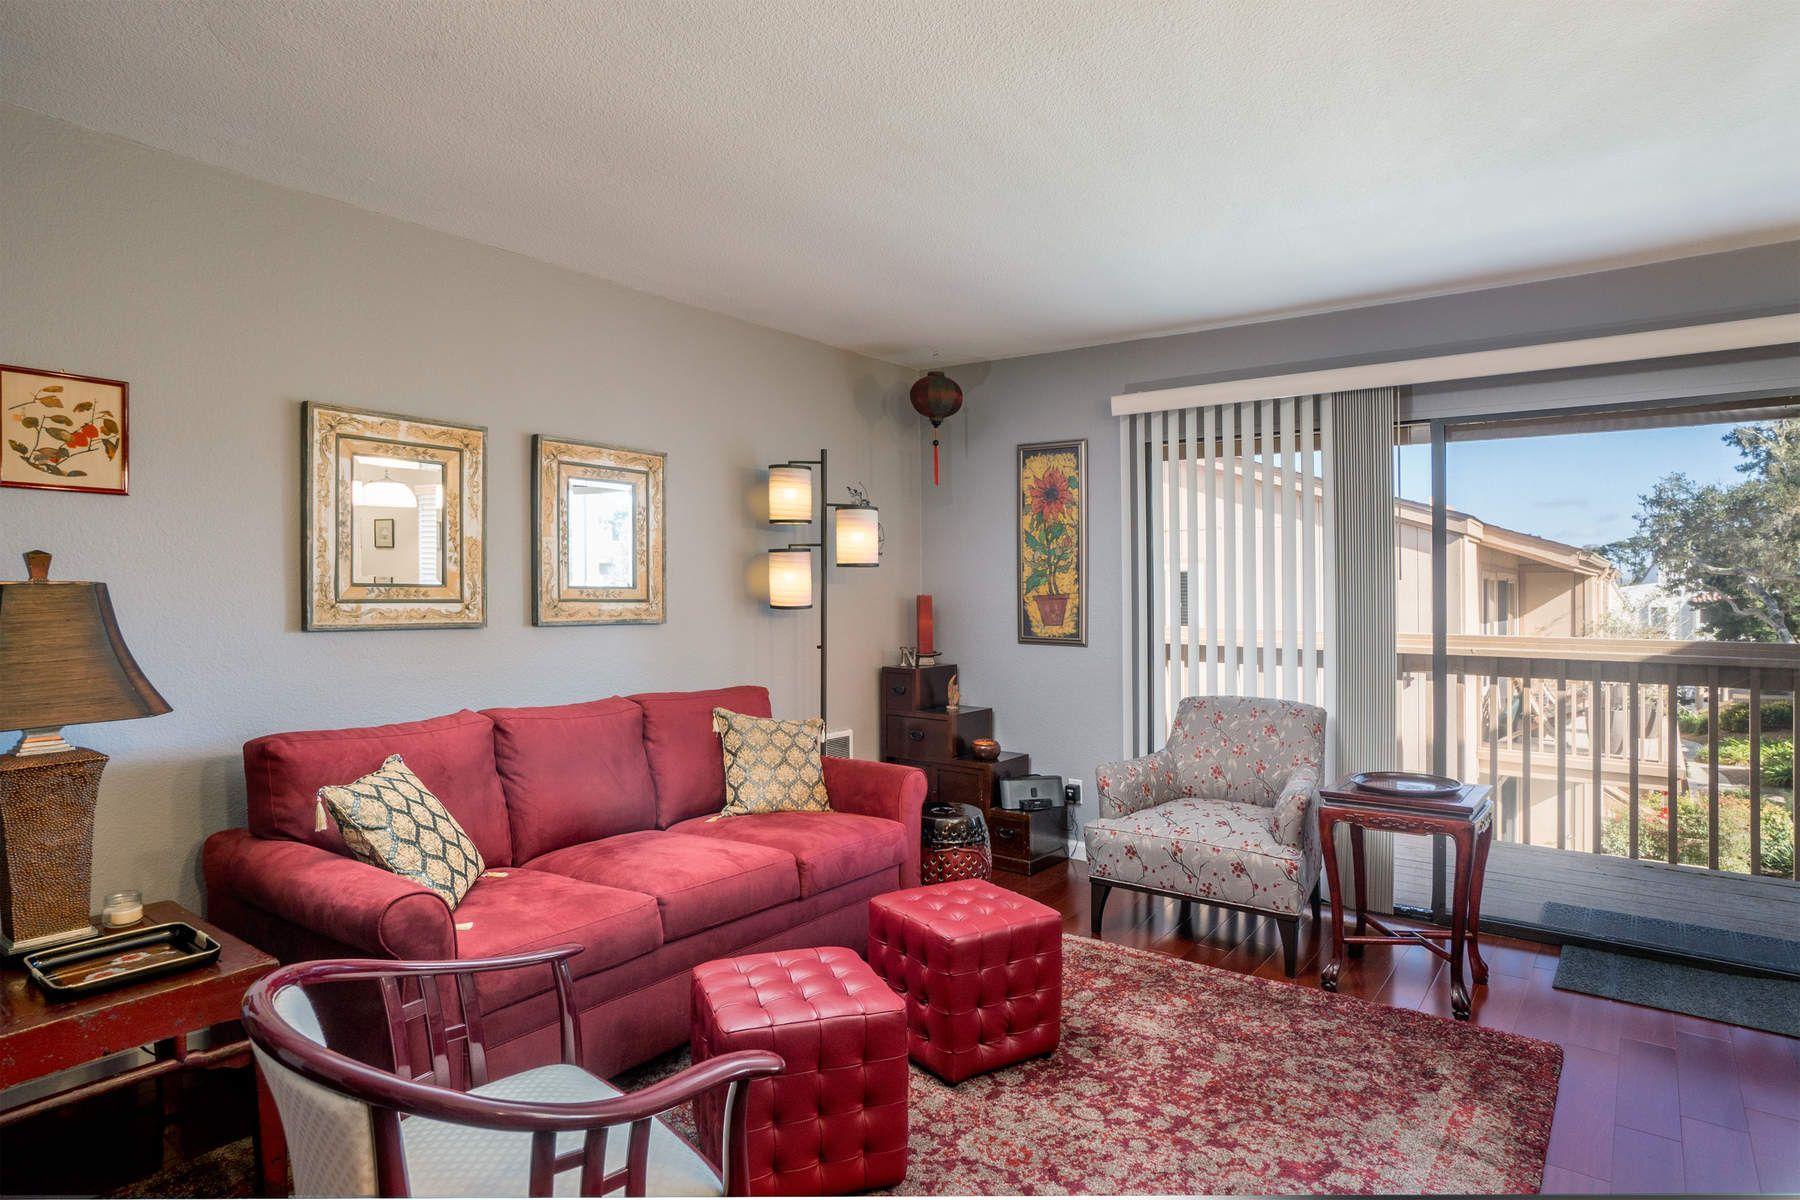 Condominium for Sale at Condo #270 - Footprints On The Bay 300 Glenwood Circle #270, Monterey, California, 93940 United States